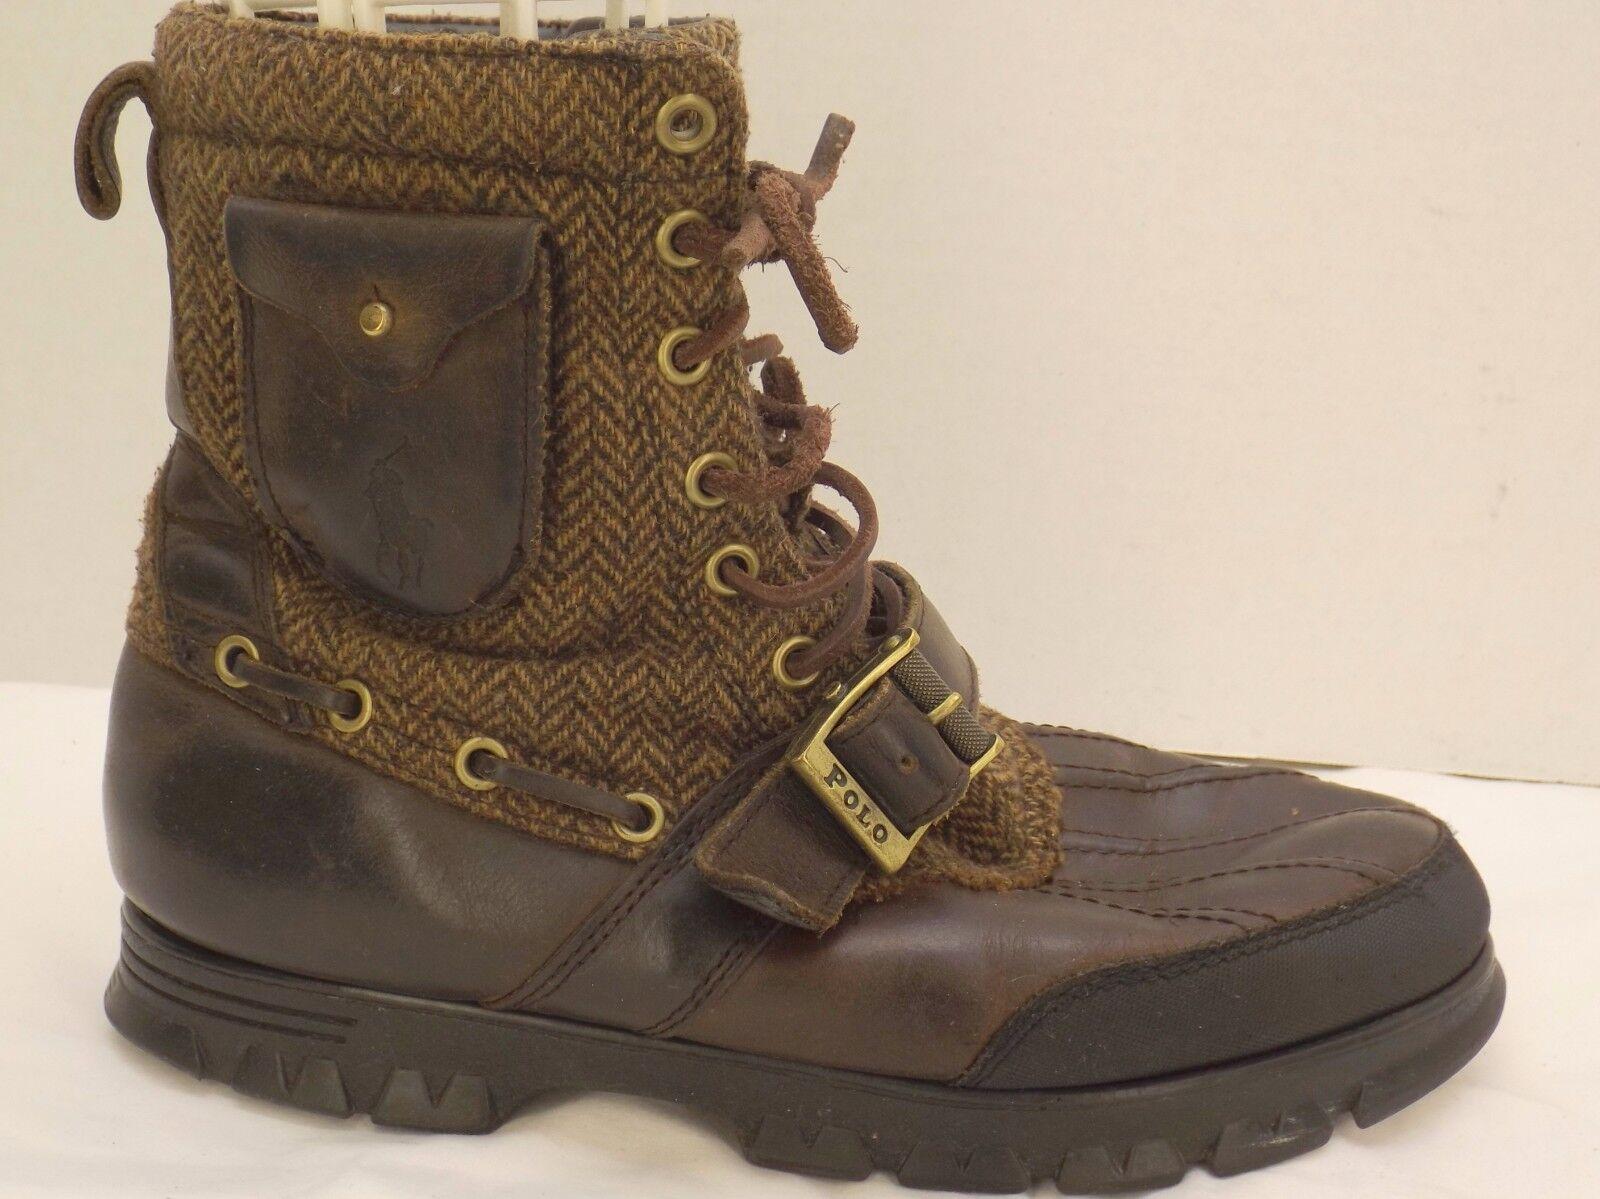 Sz 9 D LAUREN mens Braun Leder&whool RALPH LAUREN D POLO winter hiking duck style Stiefel 058315